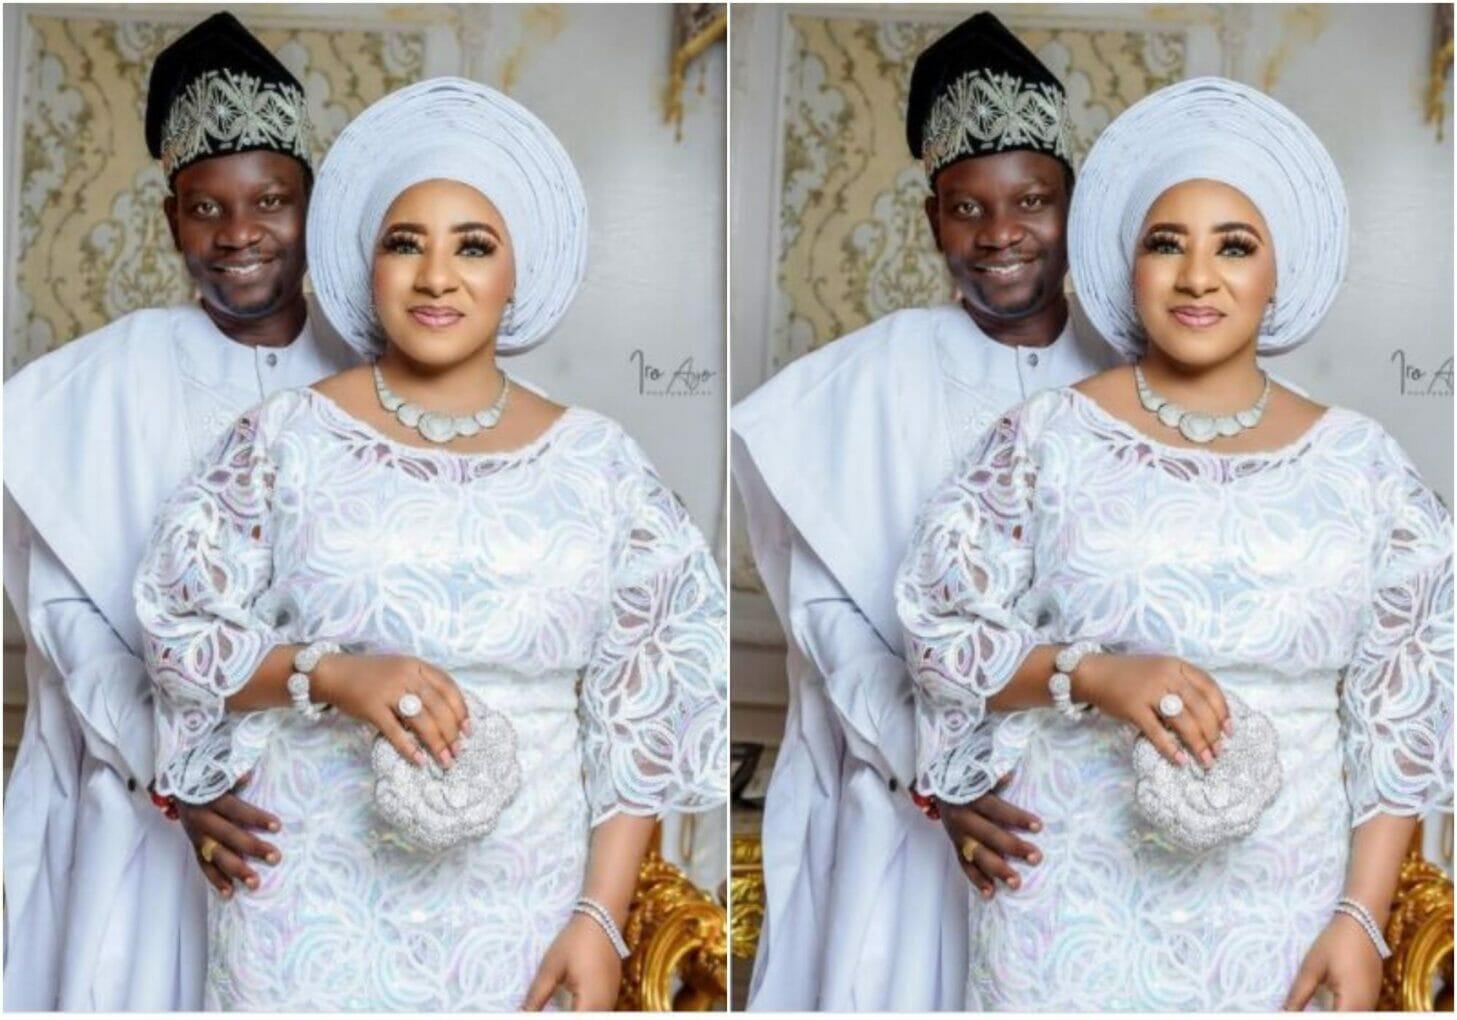 Mide Martins and husband celebrate 17th wedding anniversary